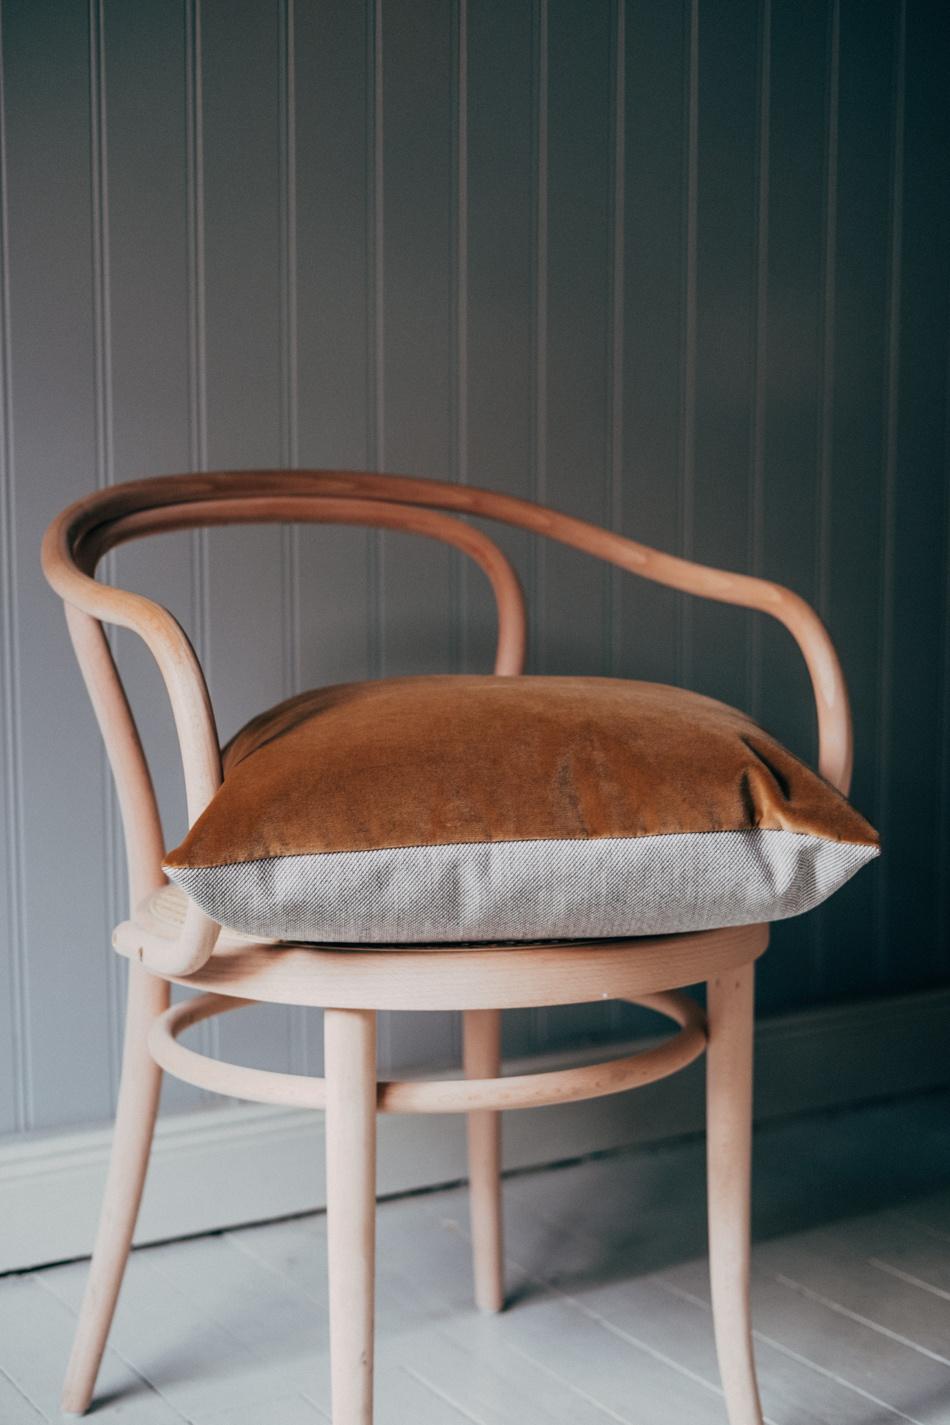 HAY Cushion Ectlectic Caramel